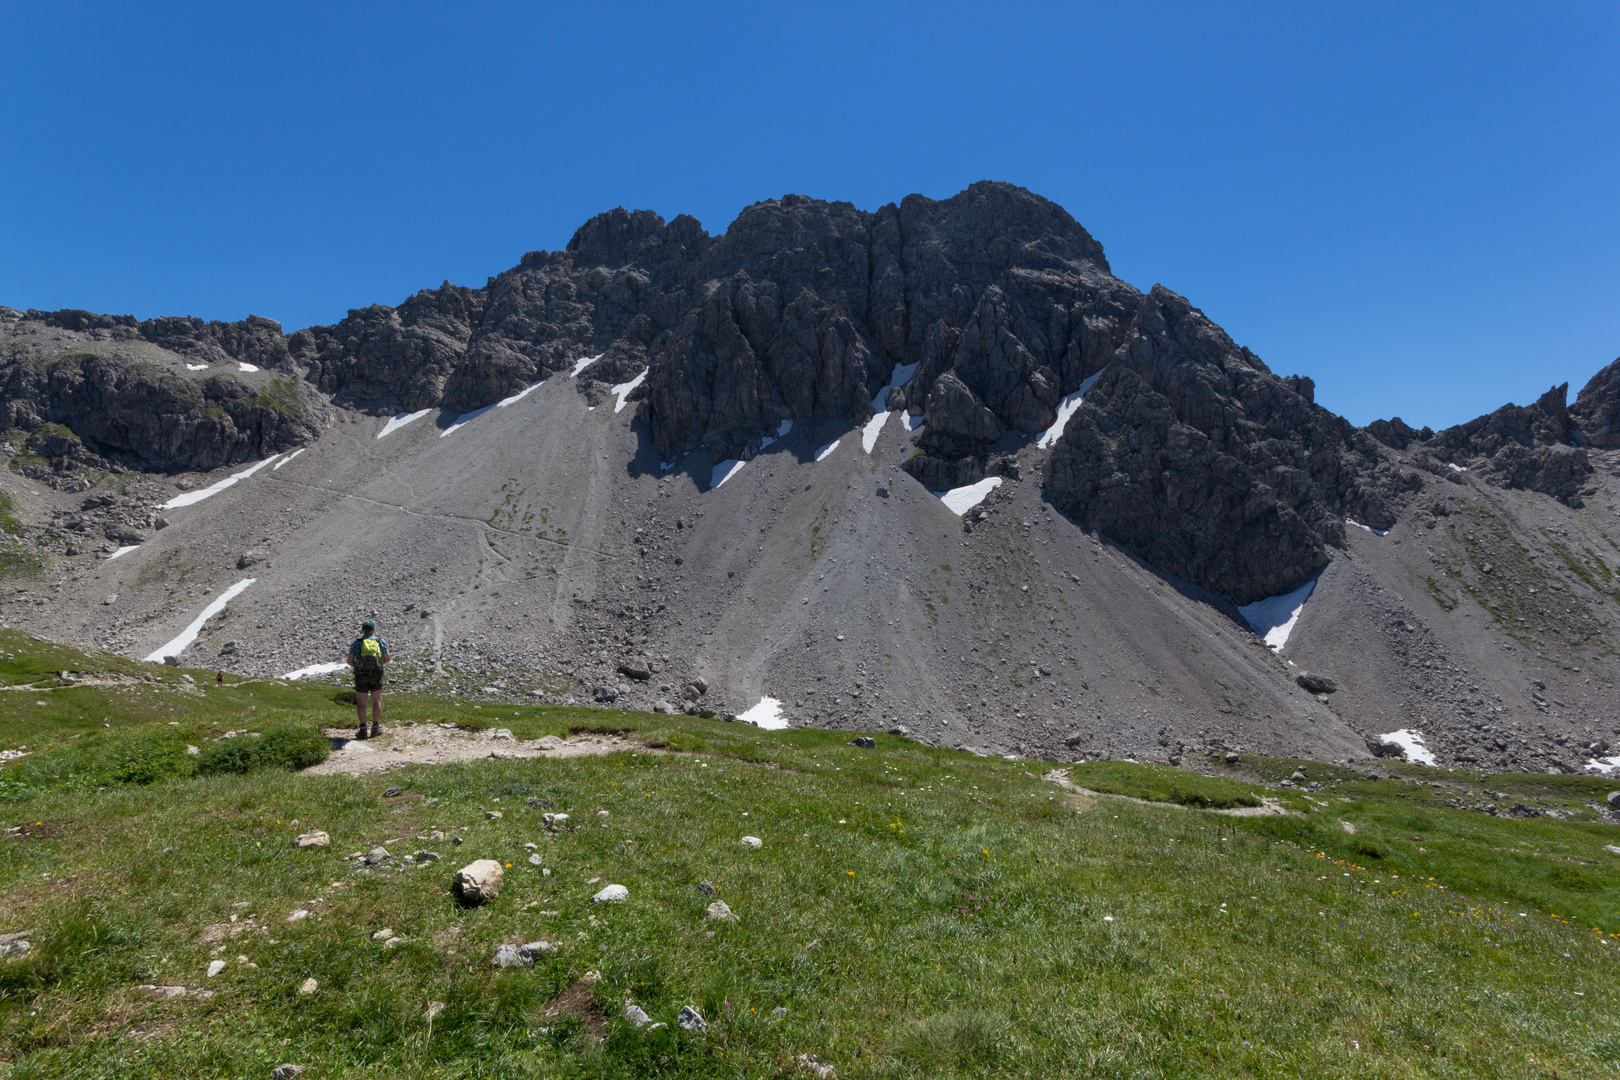 Das Allgäu - Mindelheimer Klettersteig